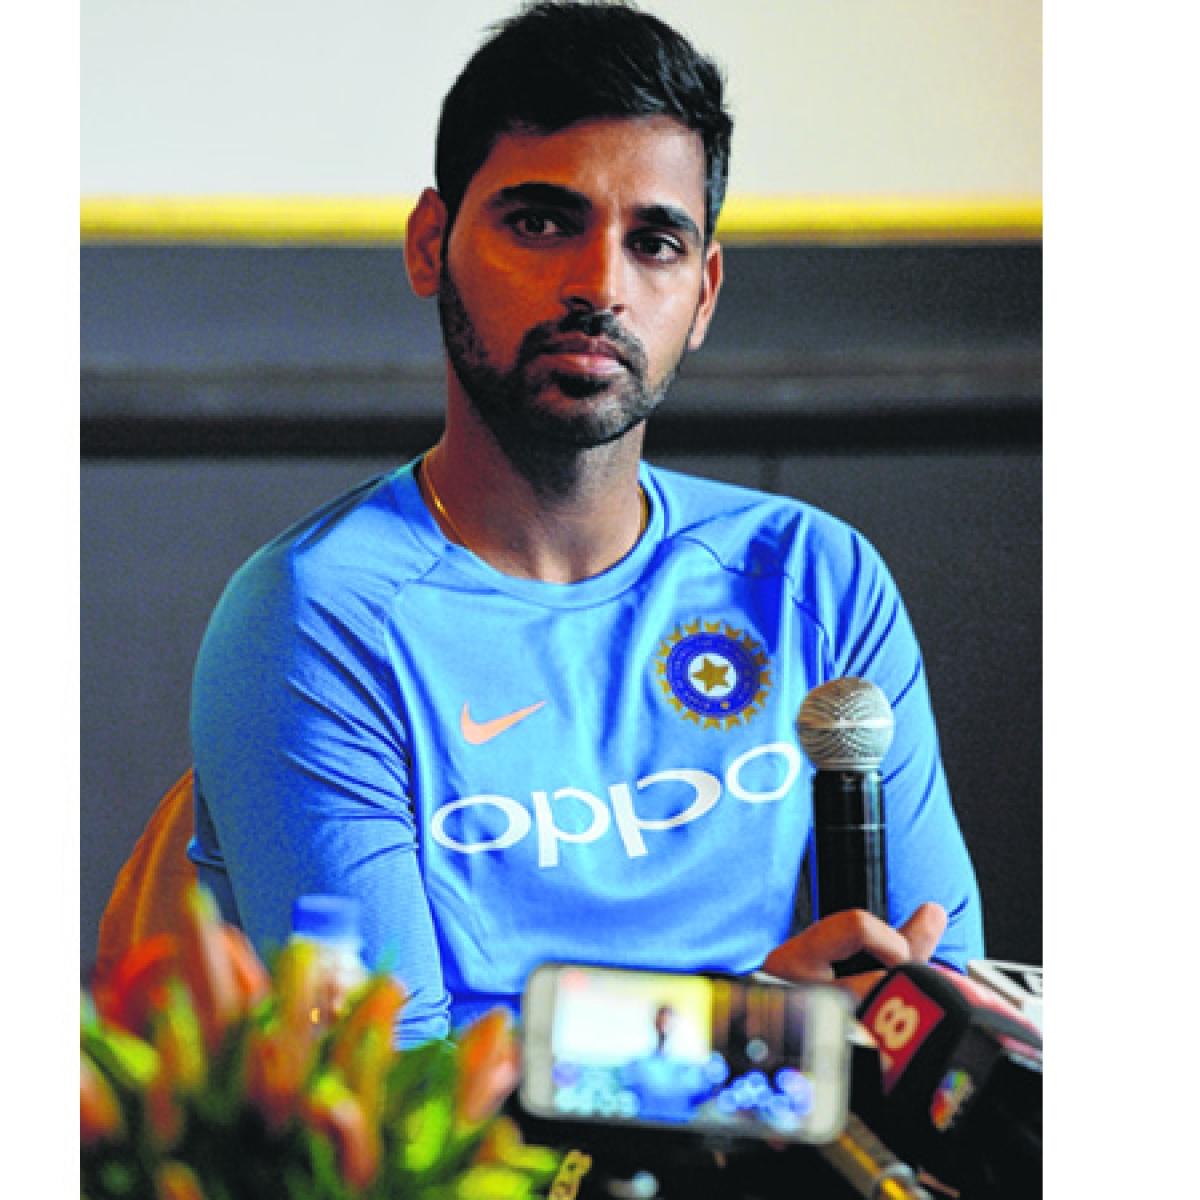 World Cup 2019: Bhuvneshwar Kumar likely to replace Chahal or Kuldeep against Bangladesh